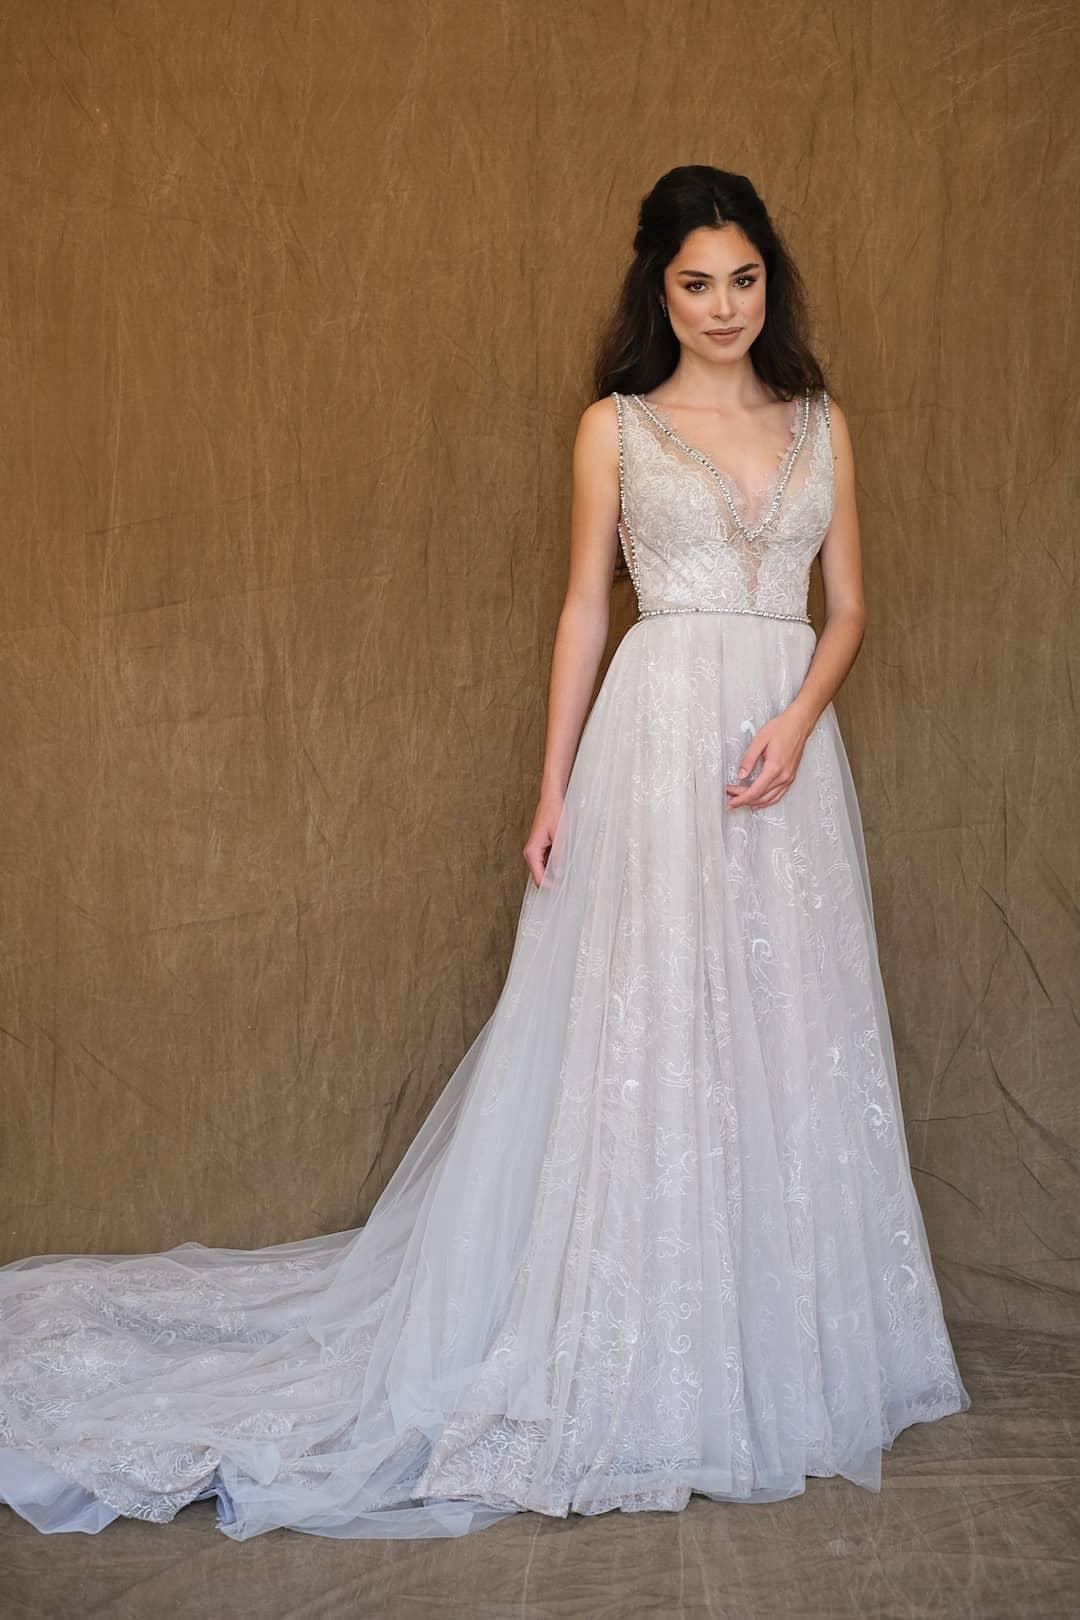 Haute Couture Brautkleider - Galia Lahav - Gala 711 - front